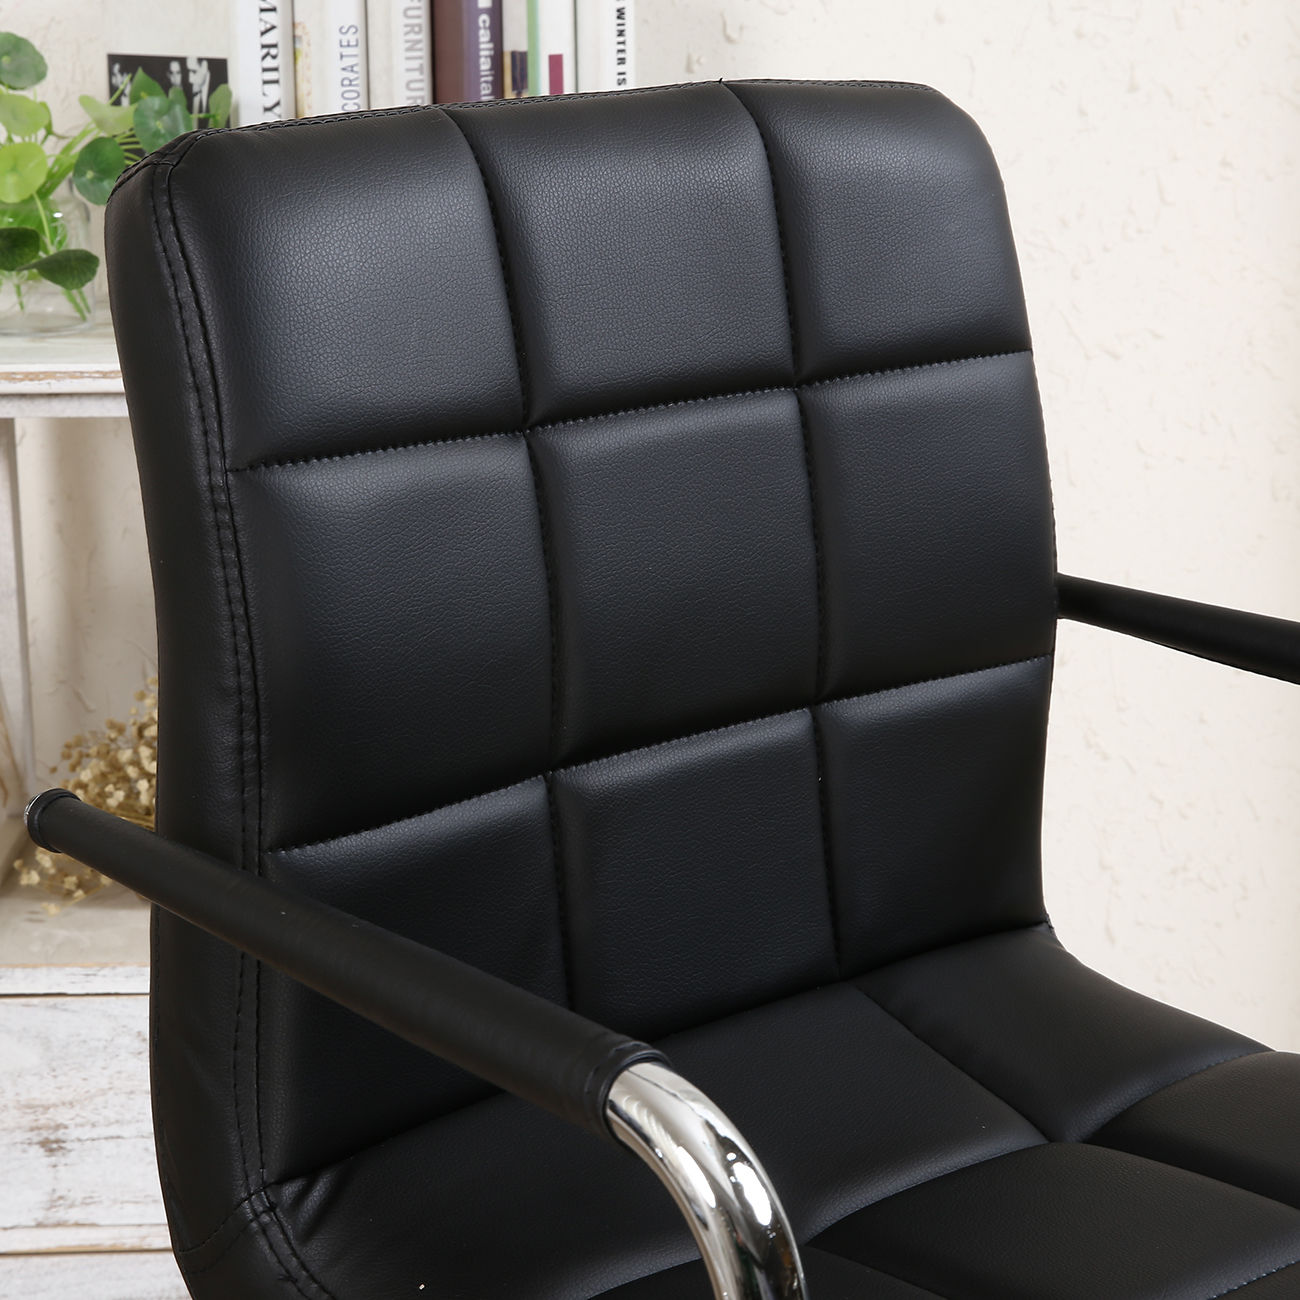 2 Pack Swivel Bar Stool Pu Leather Modern Adjustable